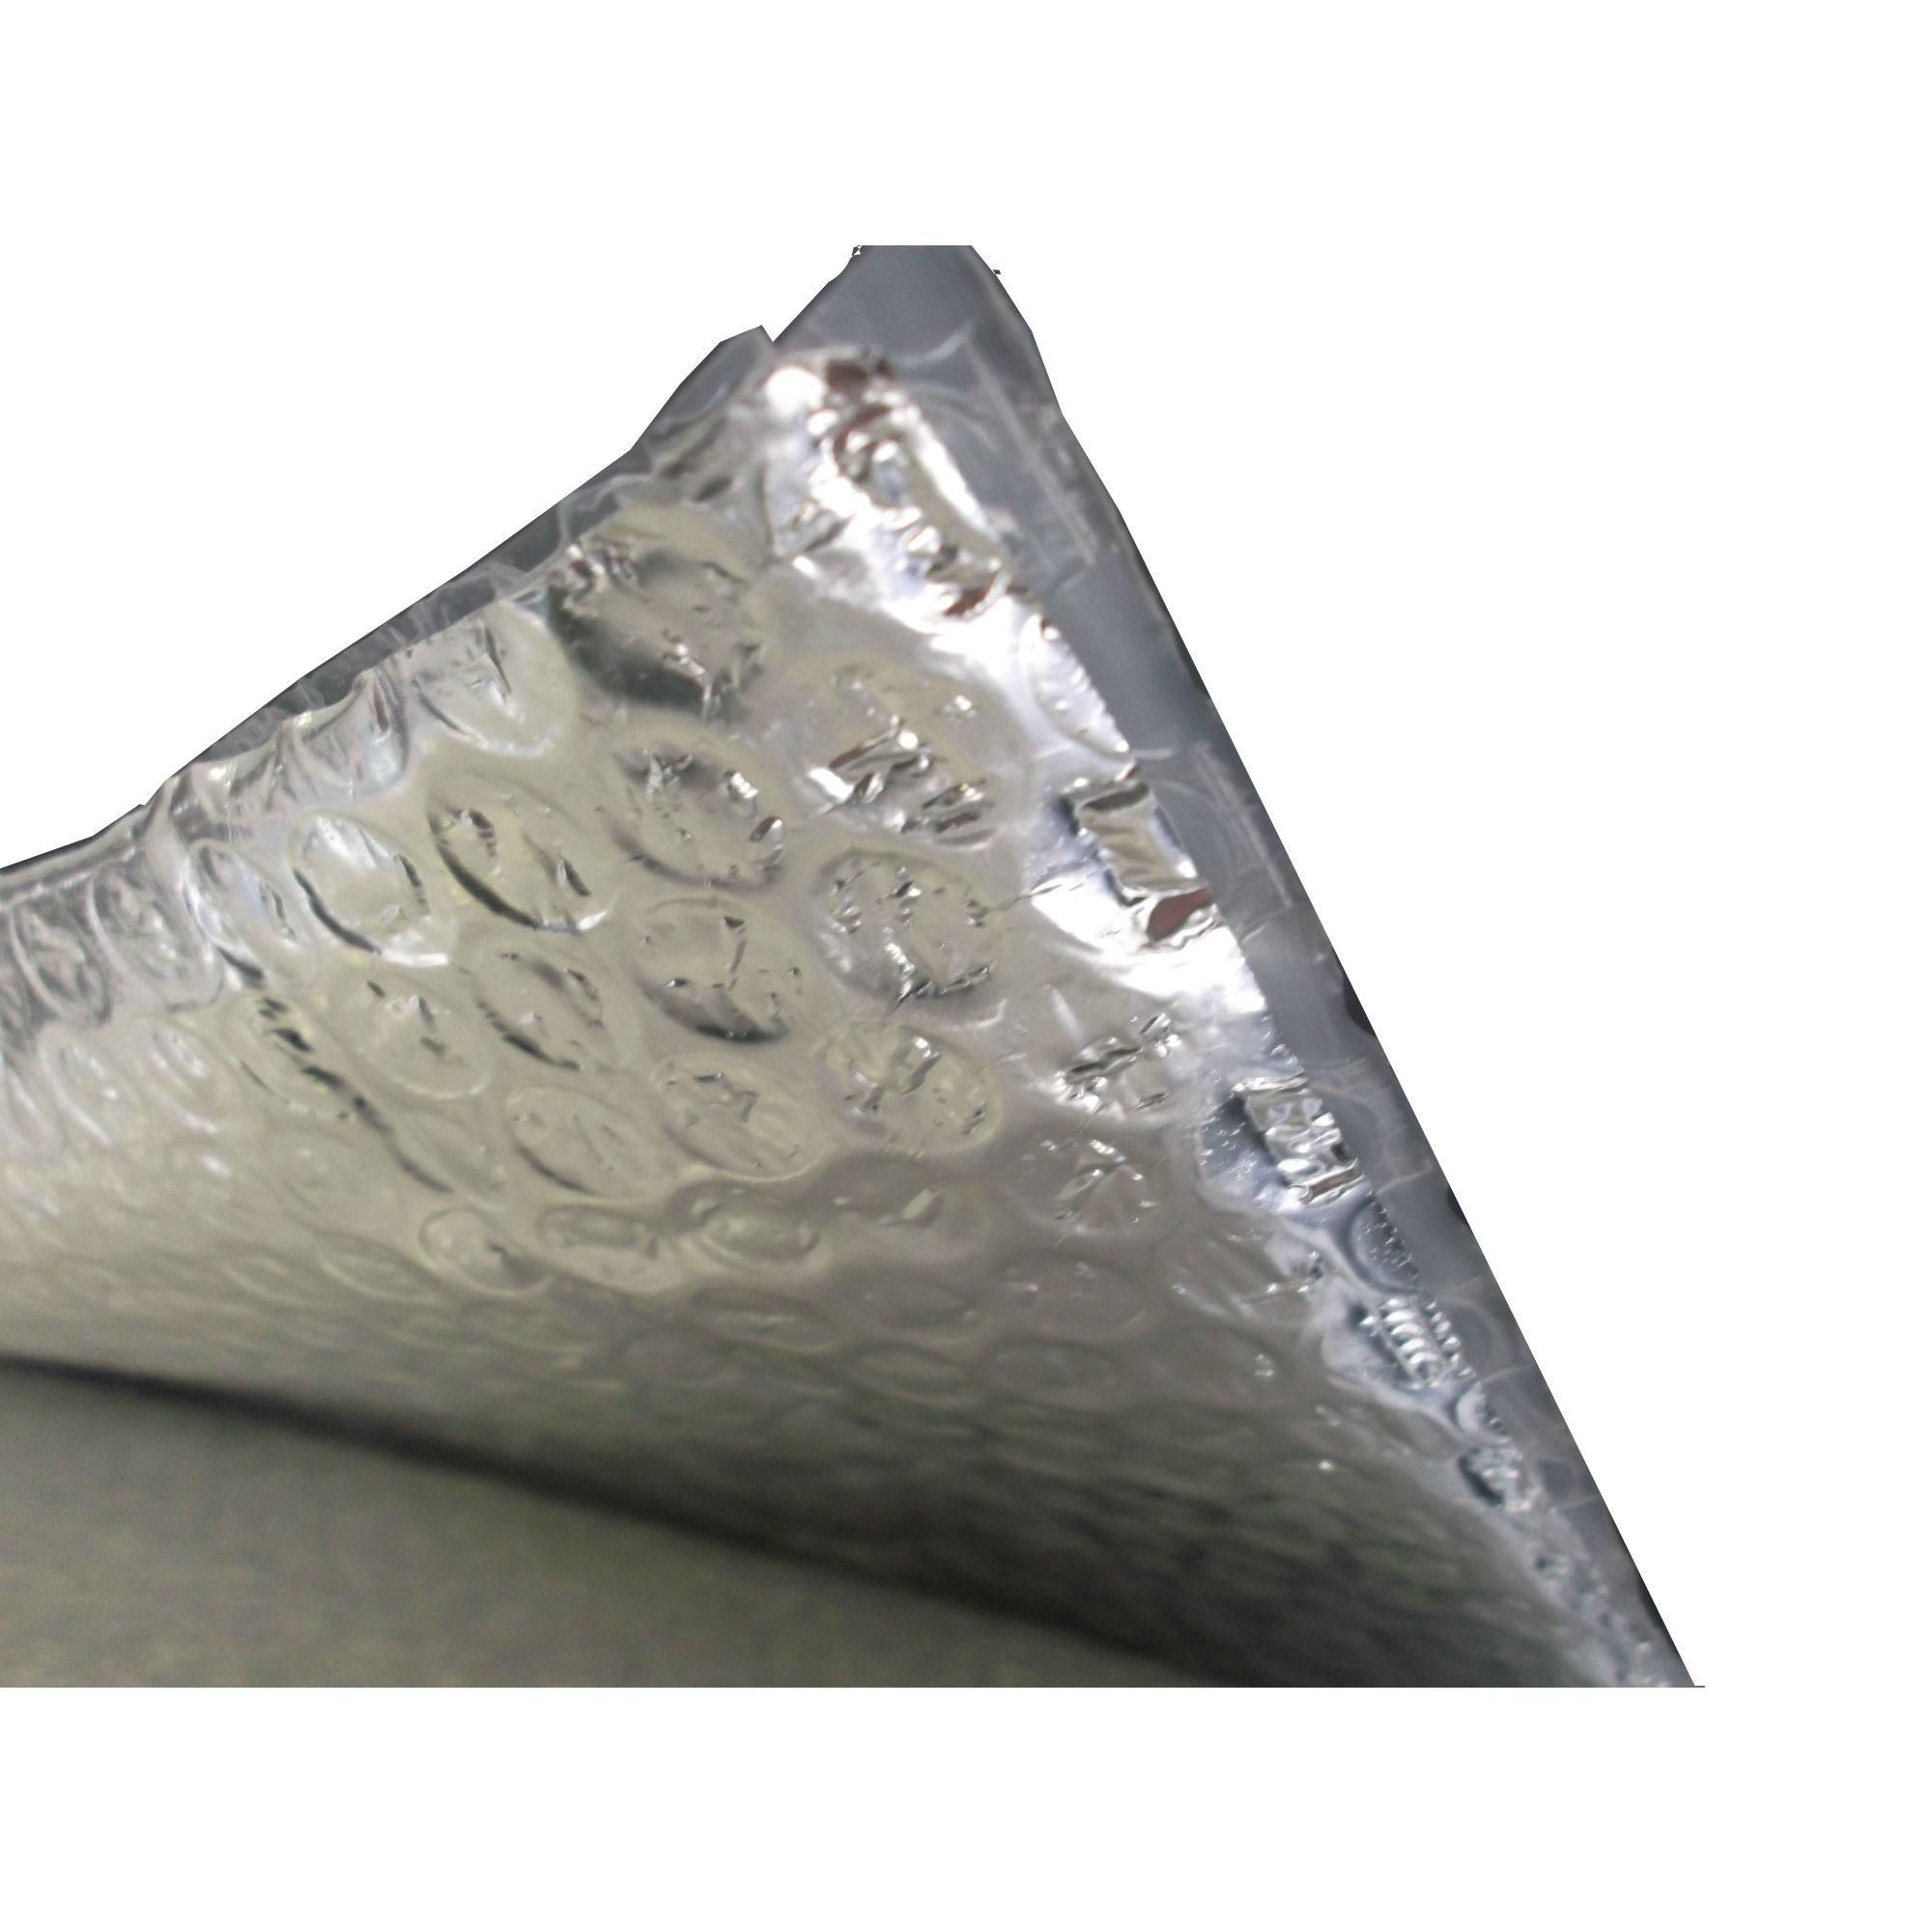 Yuzet 6 rolls single aluminium bubble insulation foil loft roof attic thermal ebay - Attic thermal insulation ...